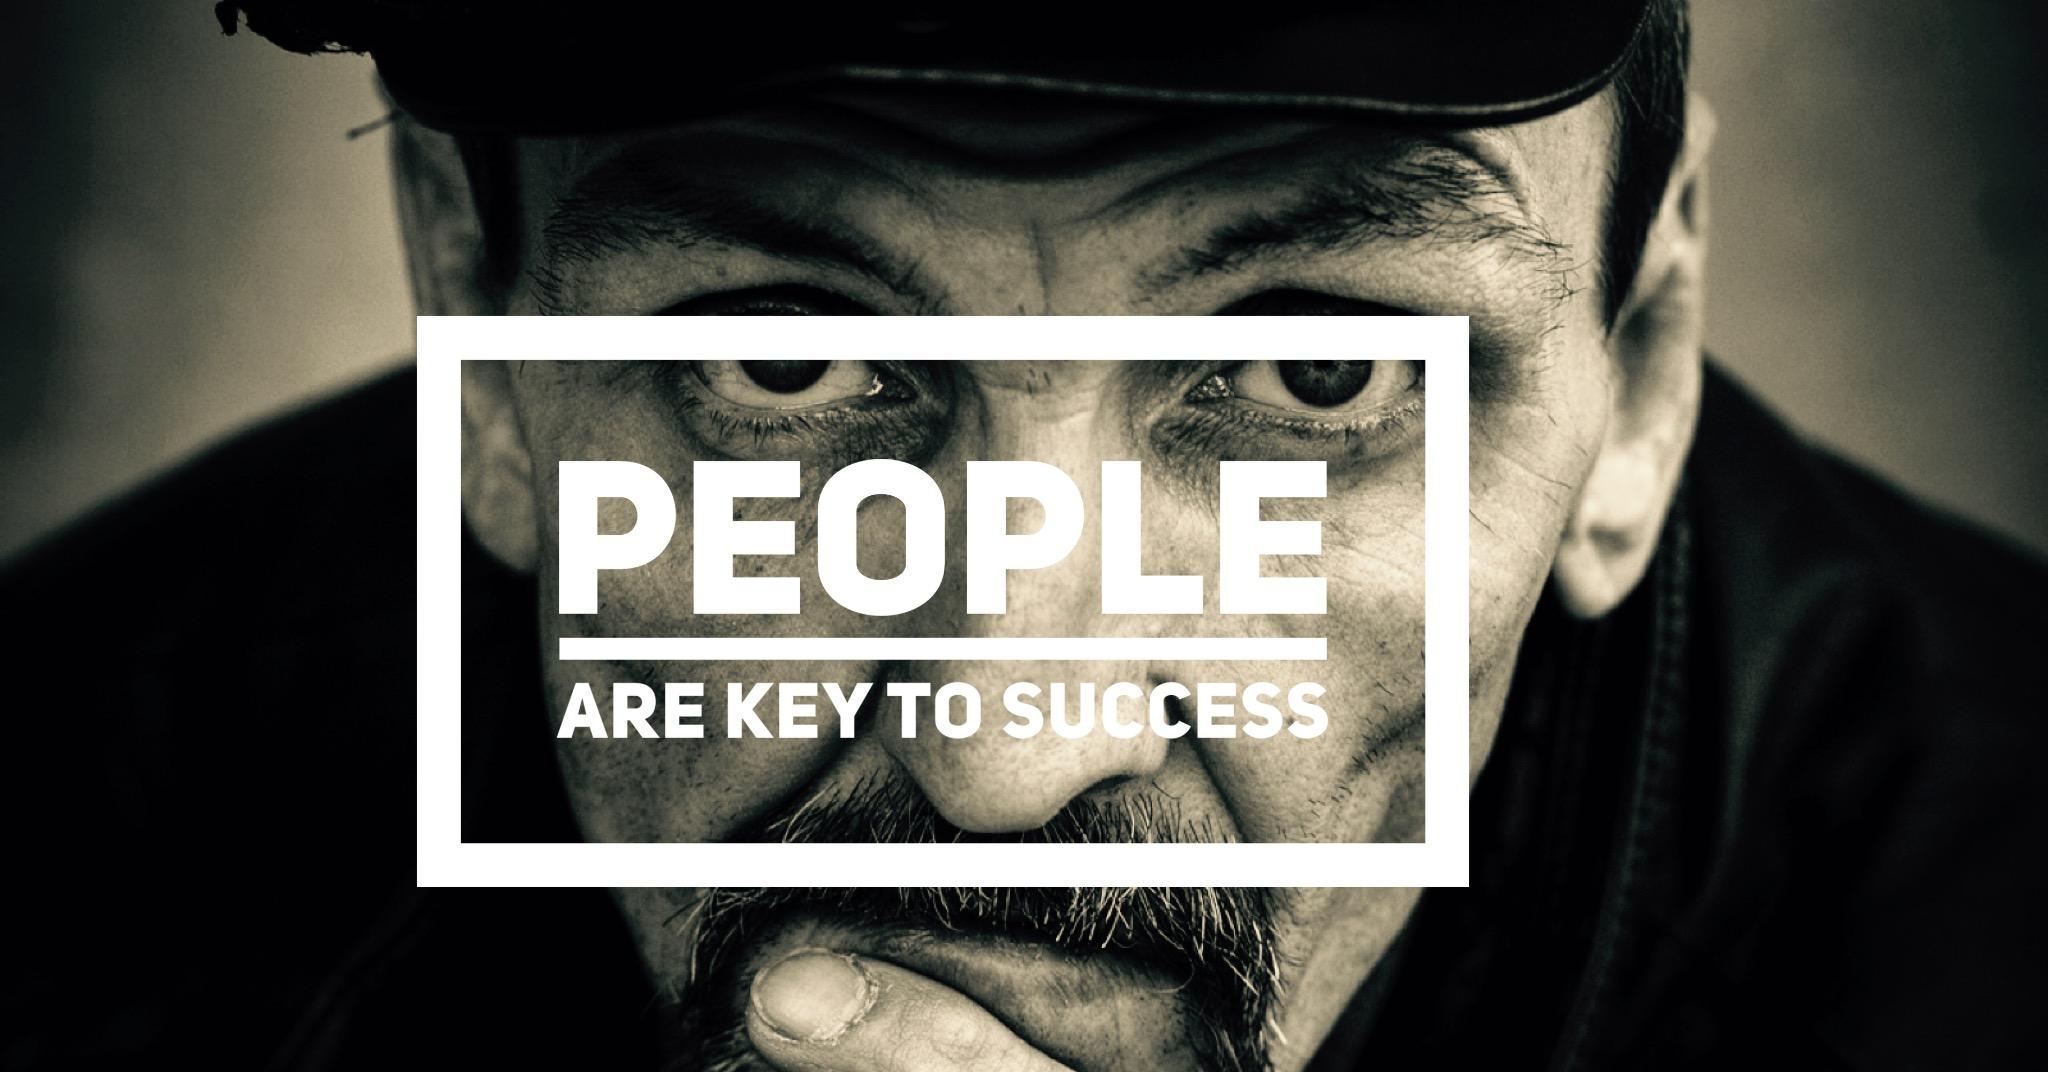 People purpose